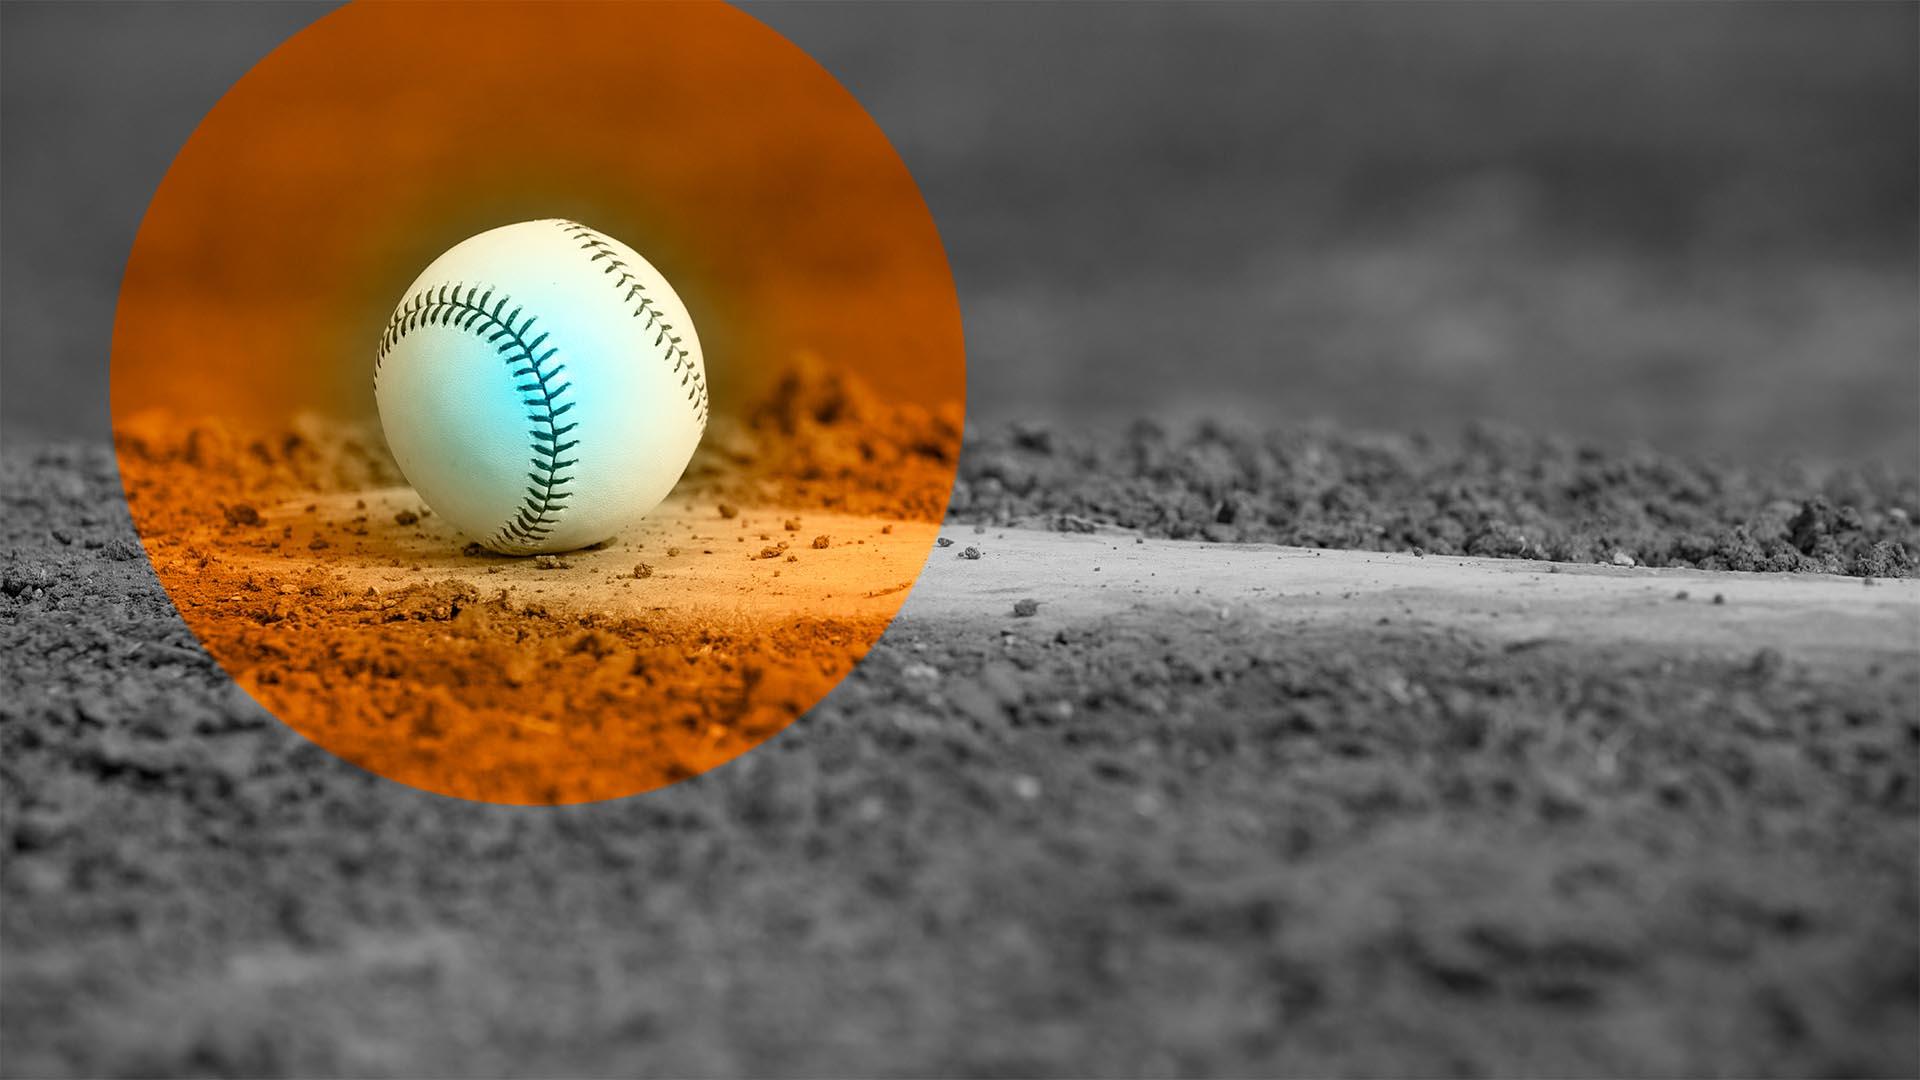 No quitarle la vista a la pelota, por Julio Castillo Sagarzazu